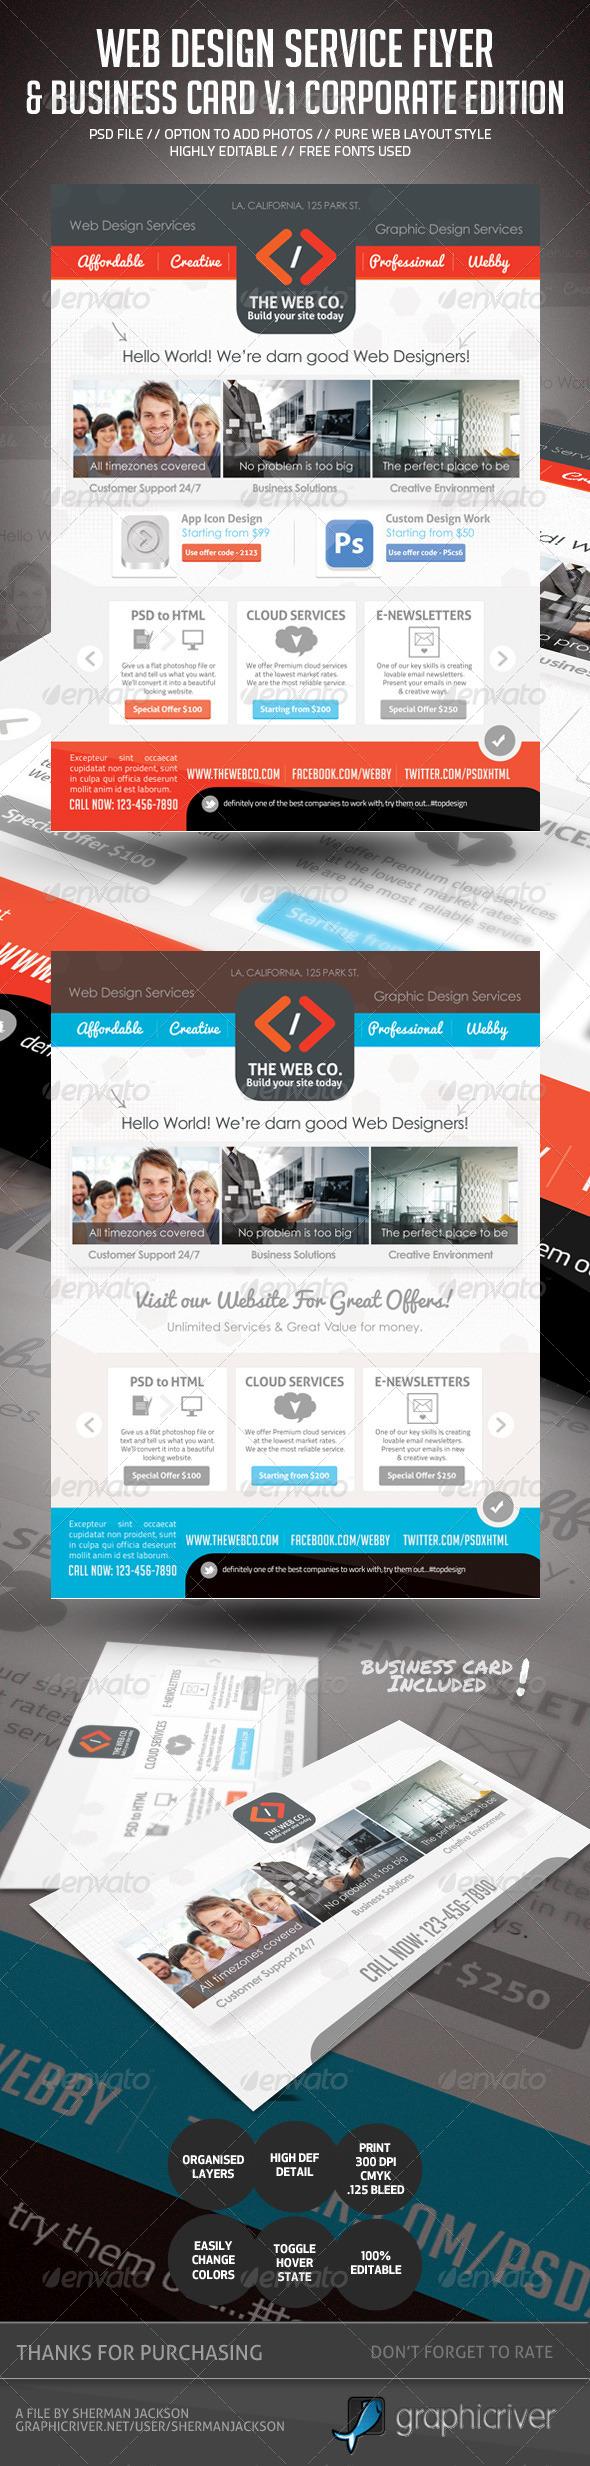 GraphicRiver Web Design Service Set 1 Flyer & Business Card 4605176